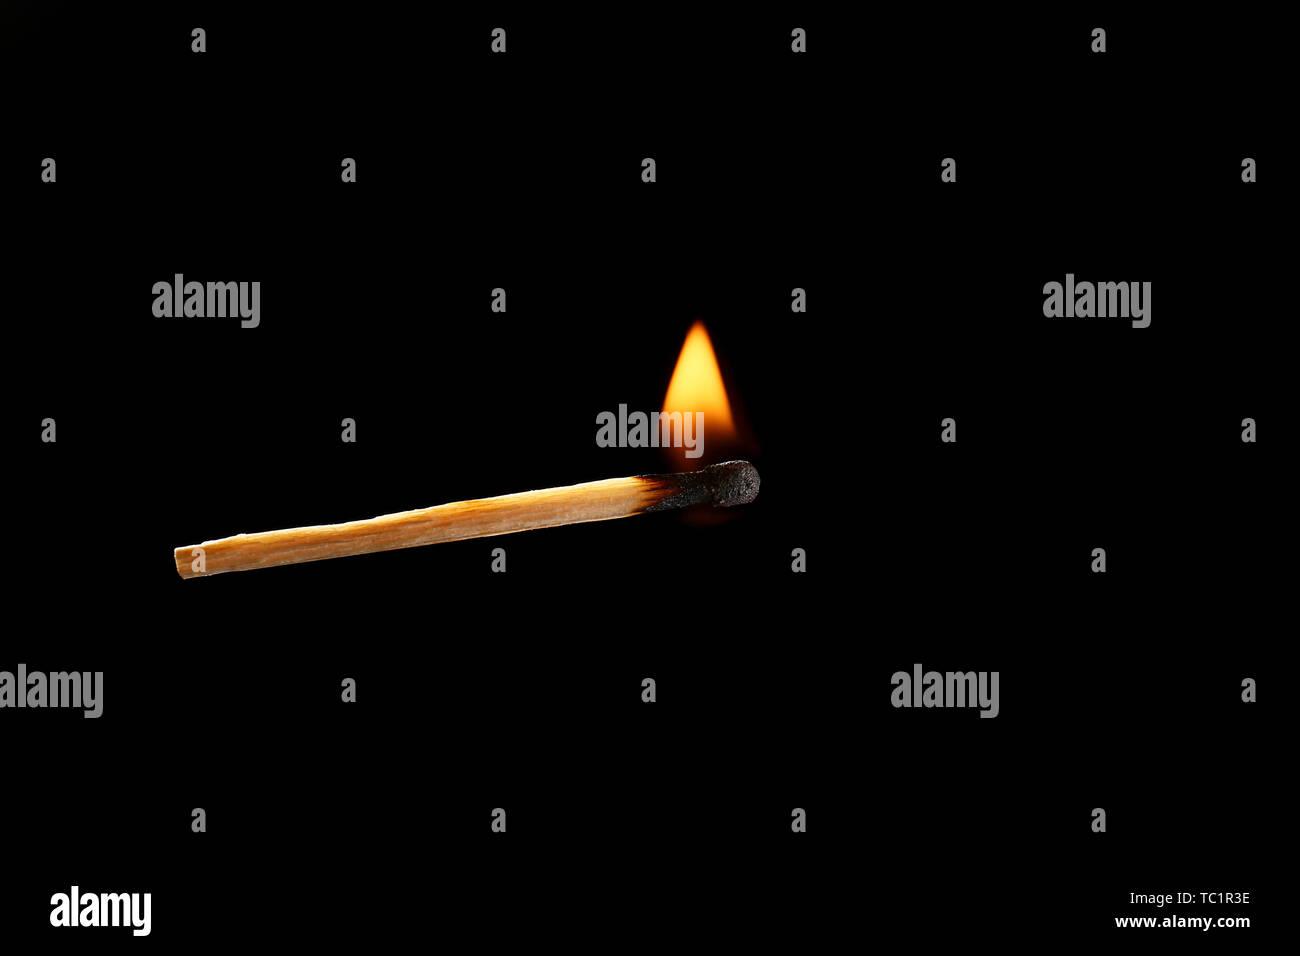 burning match on dark